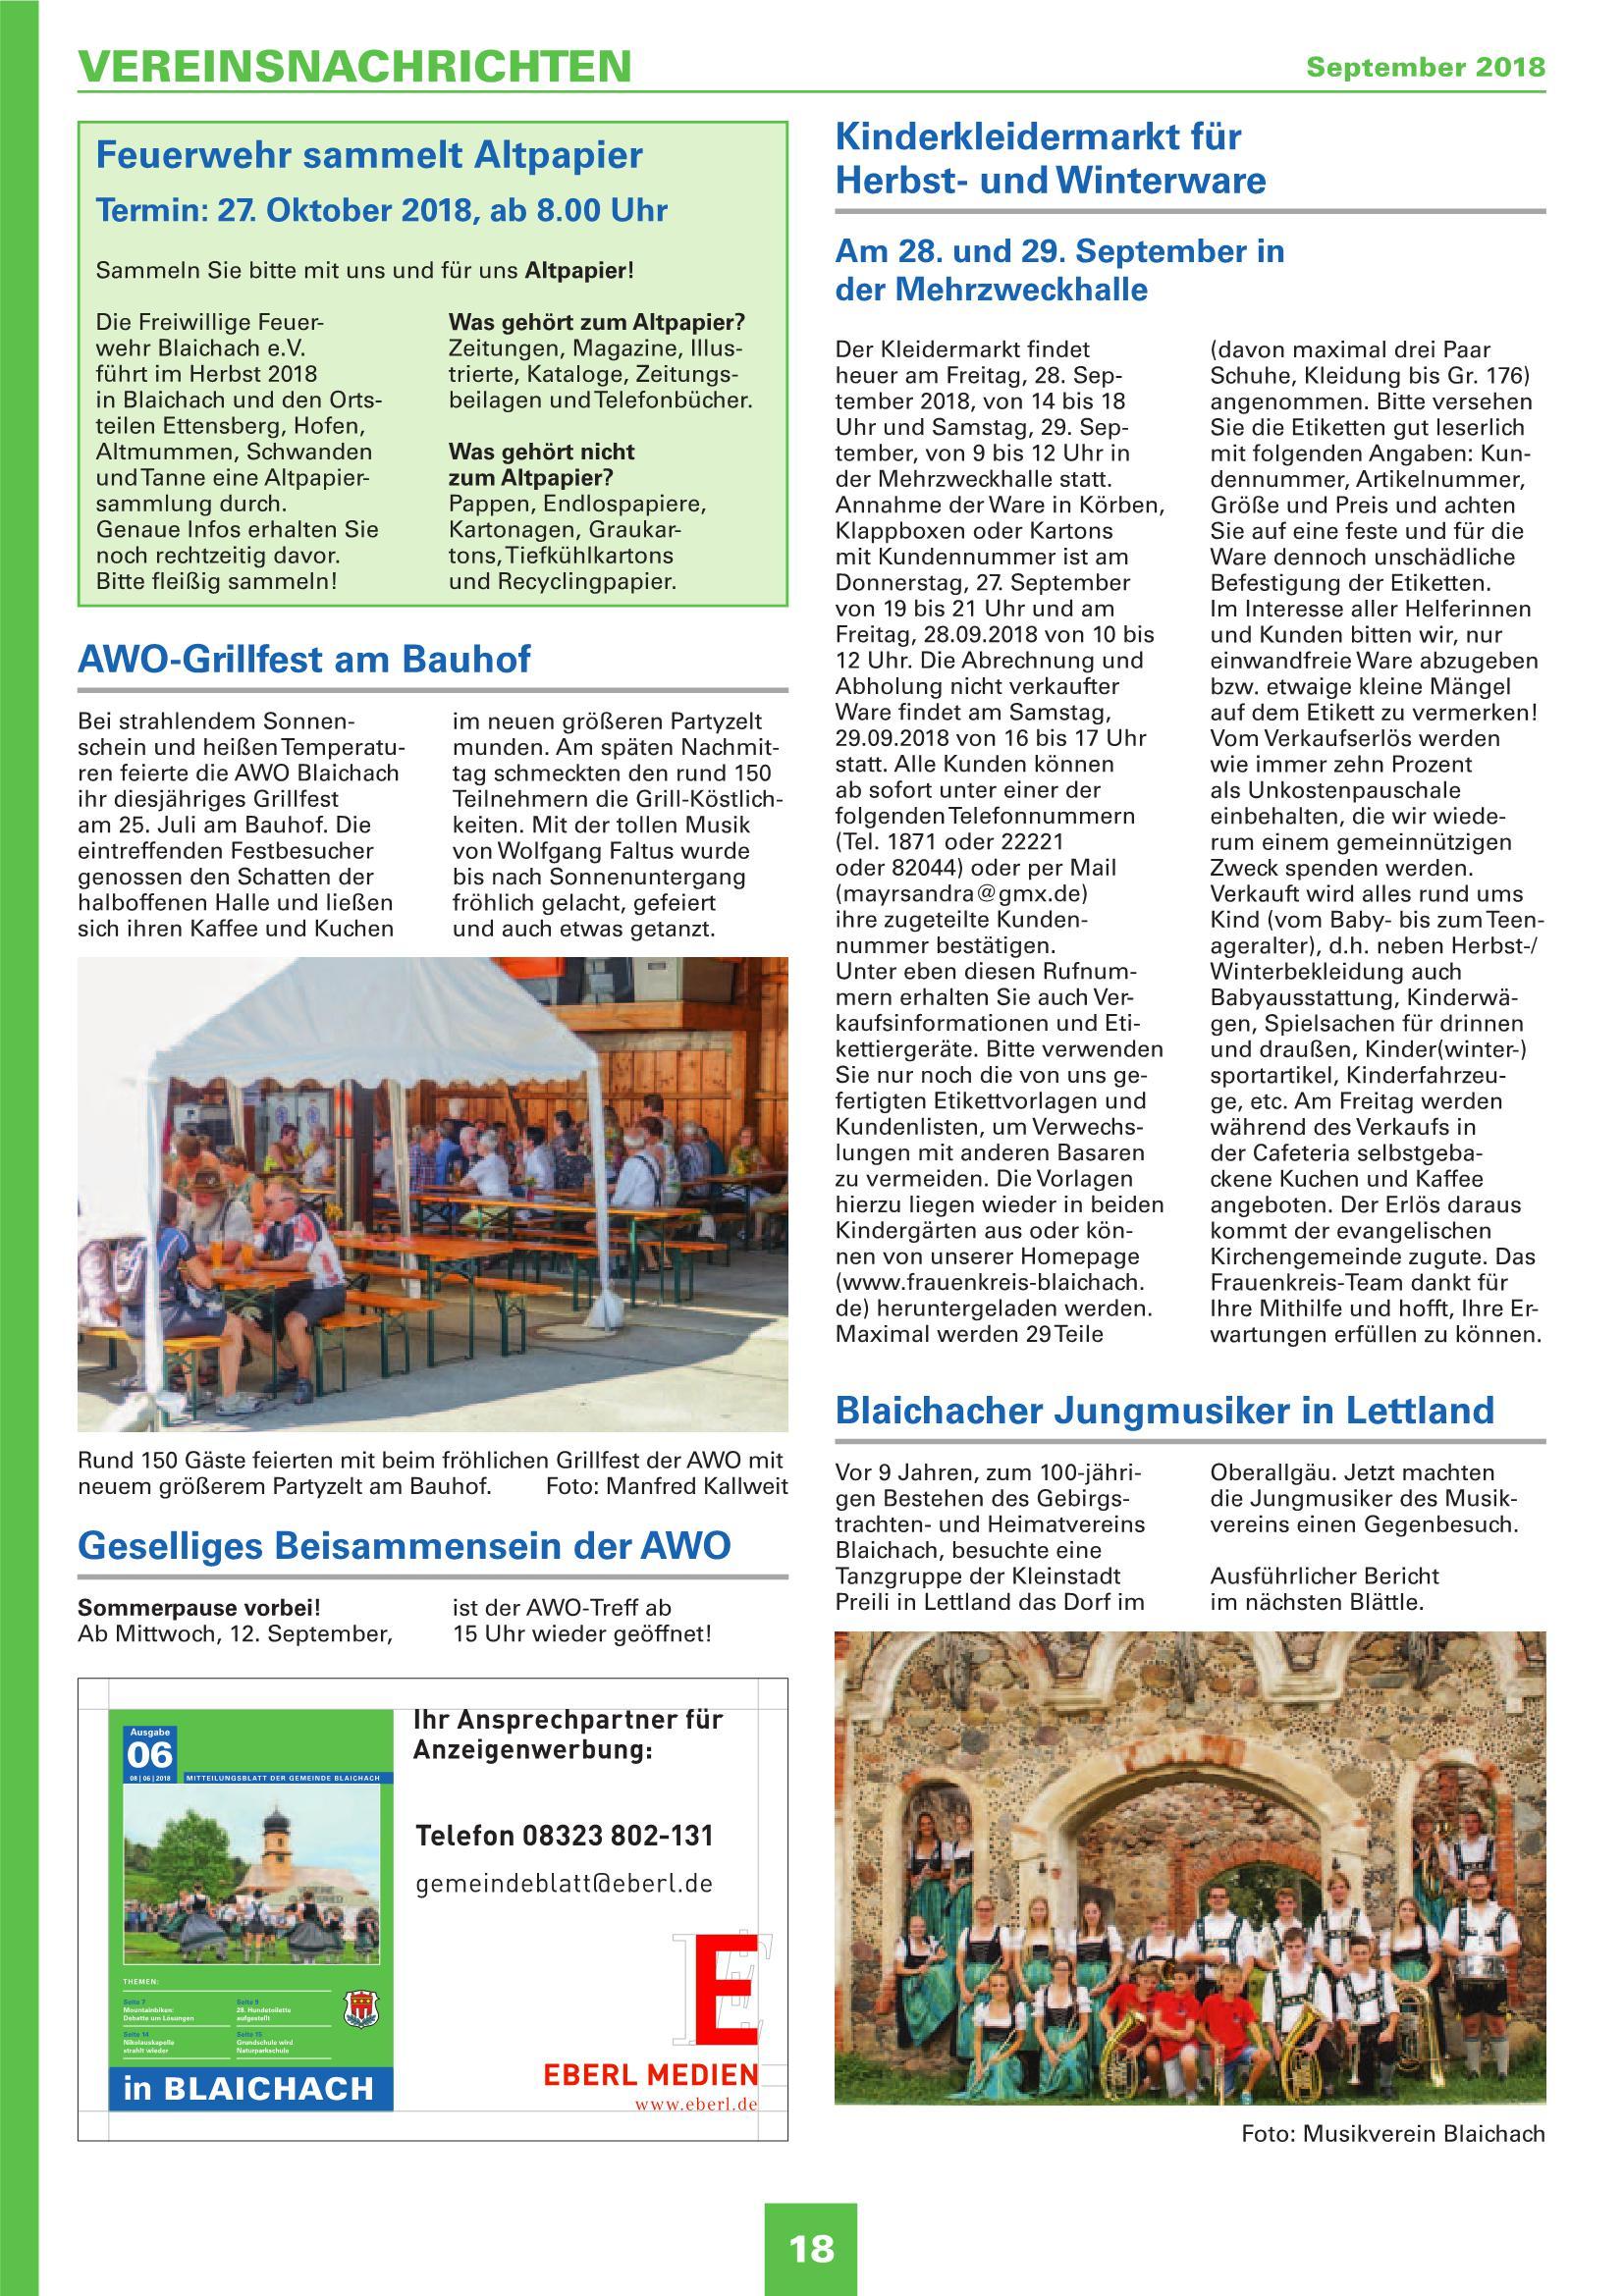 Mitteilungsblatt September 2018